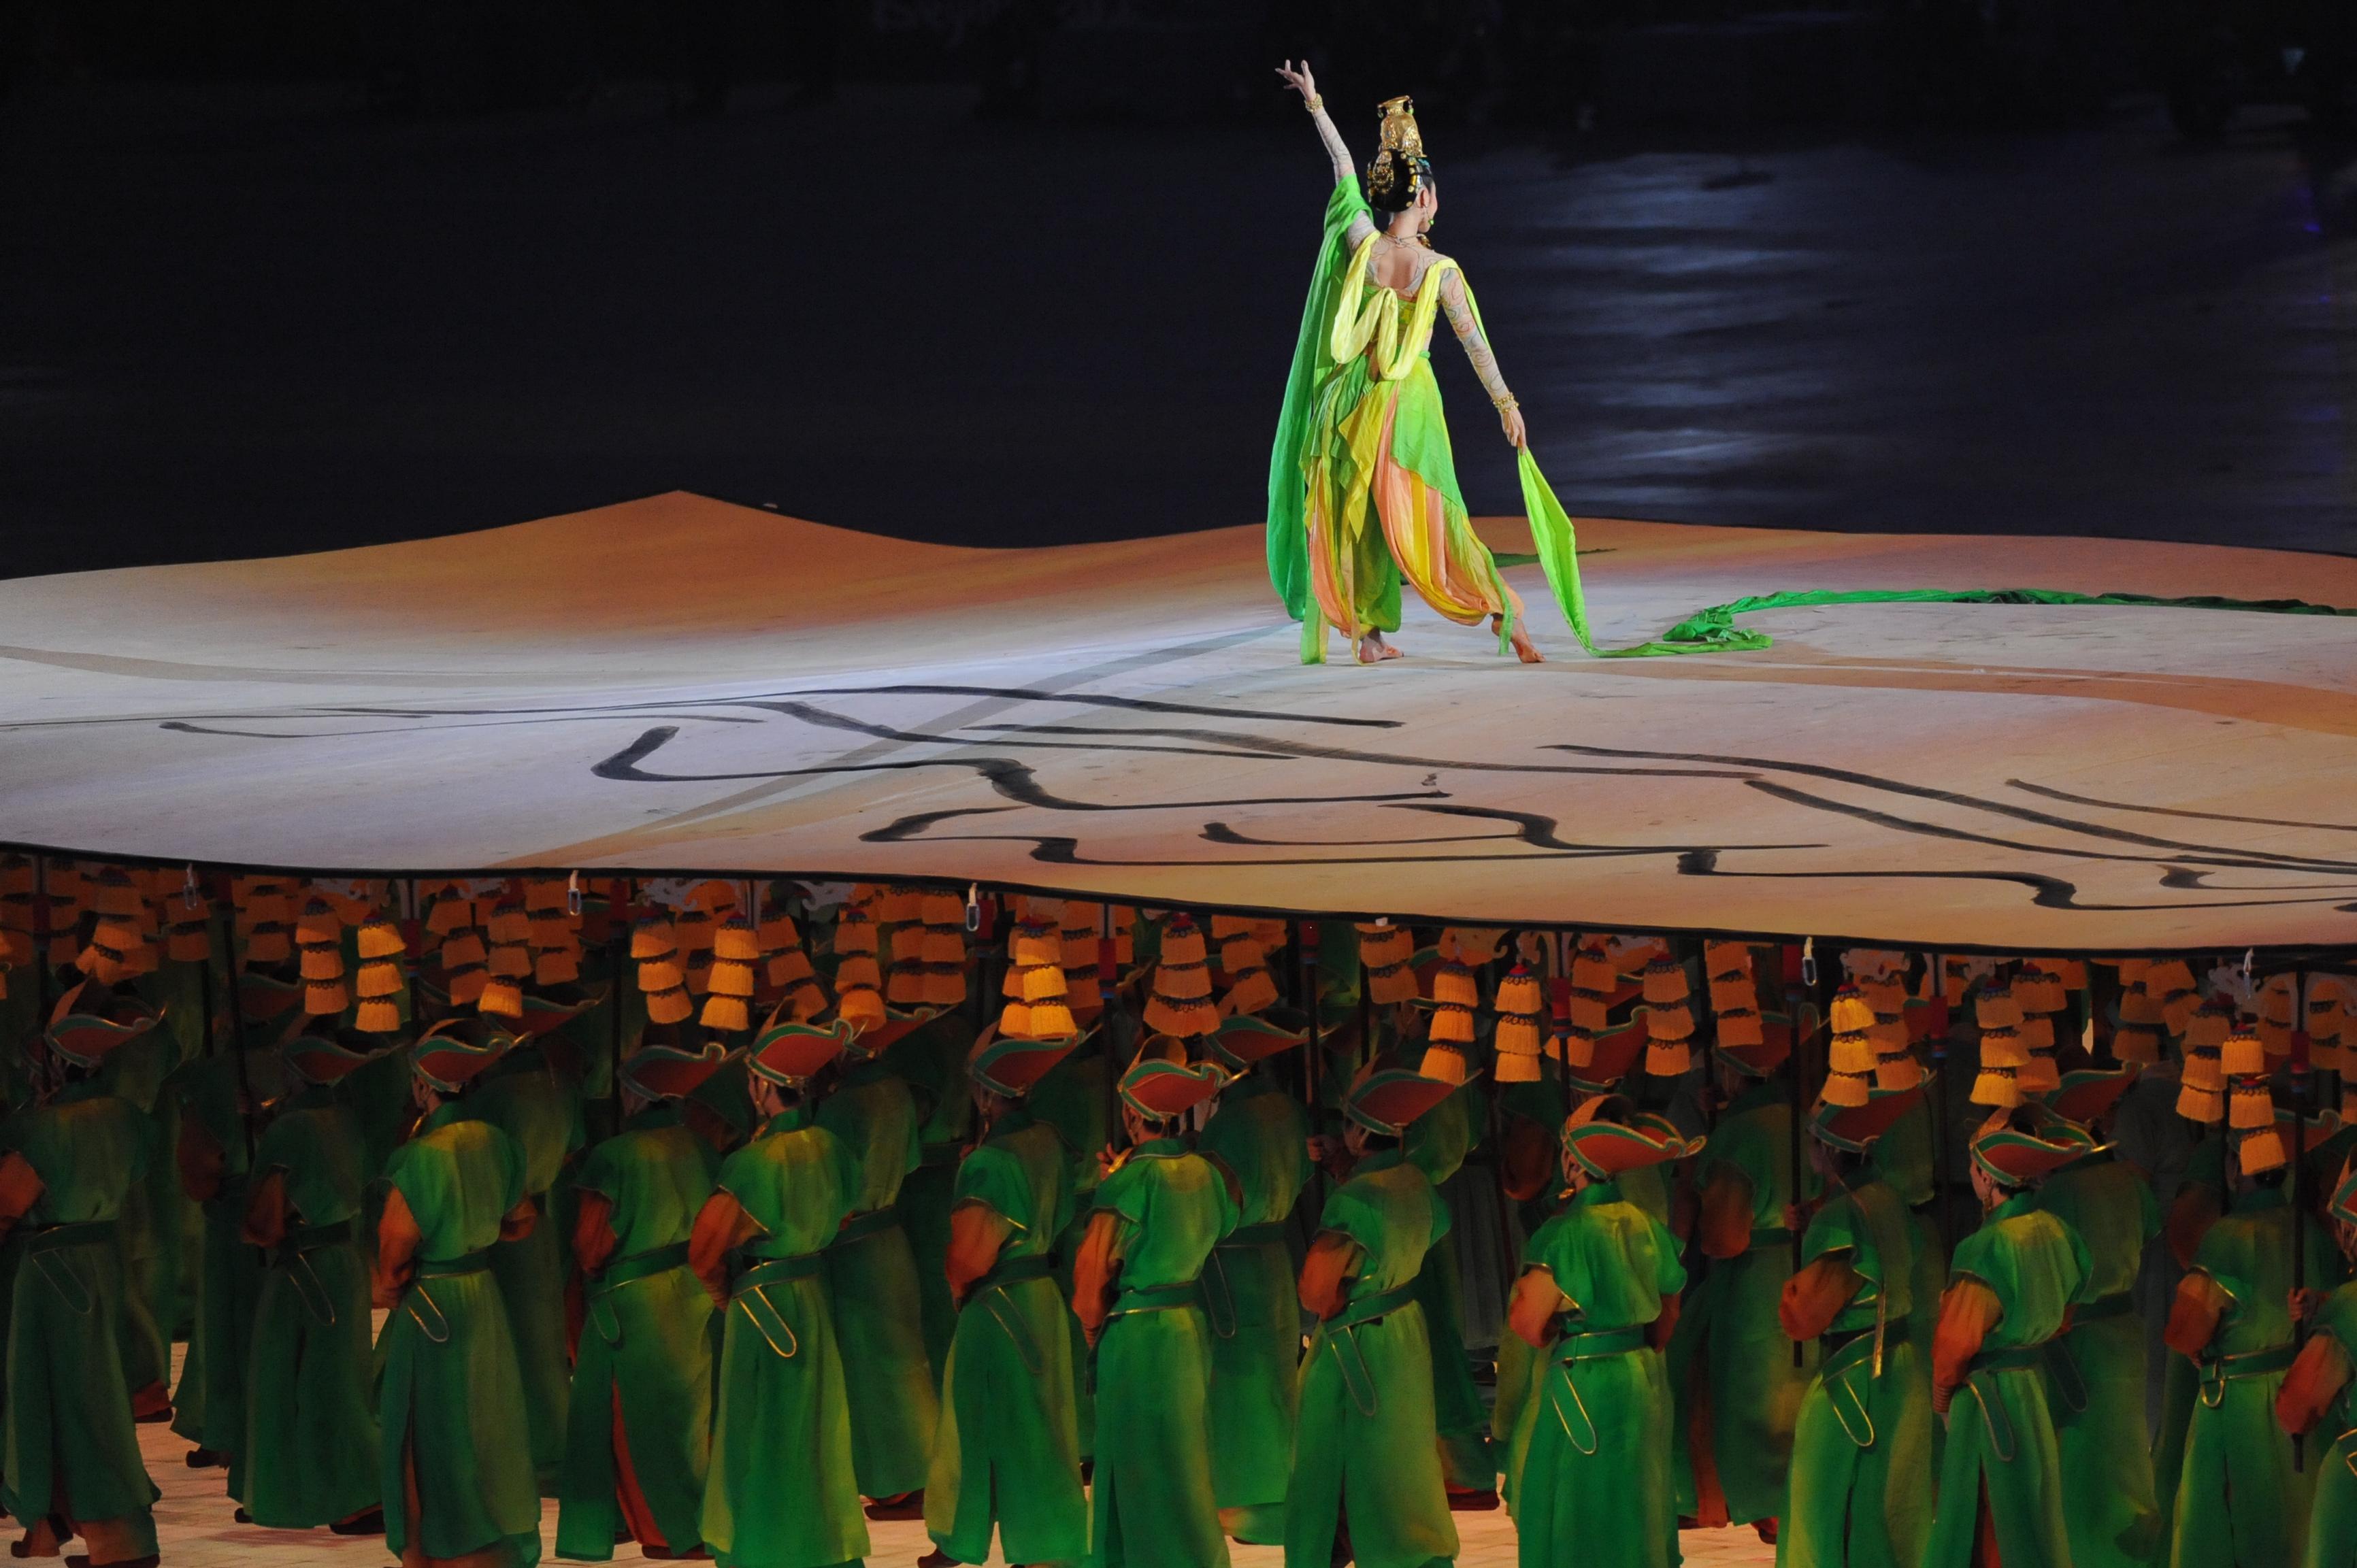 Crystal CG shines as Olympics digital image supplier